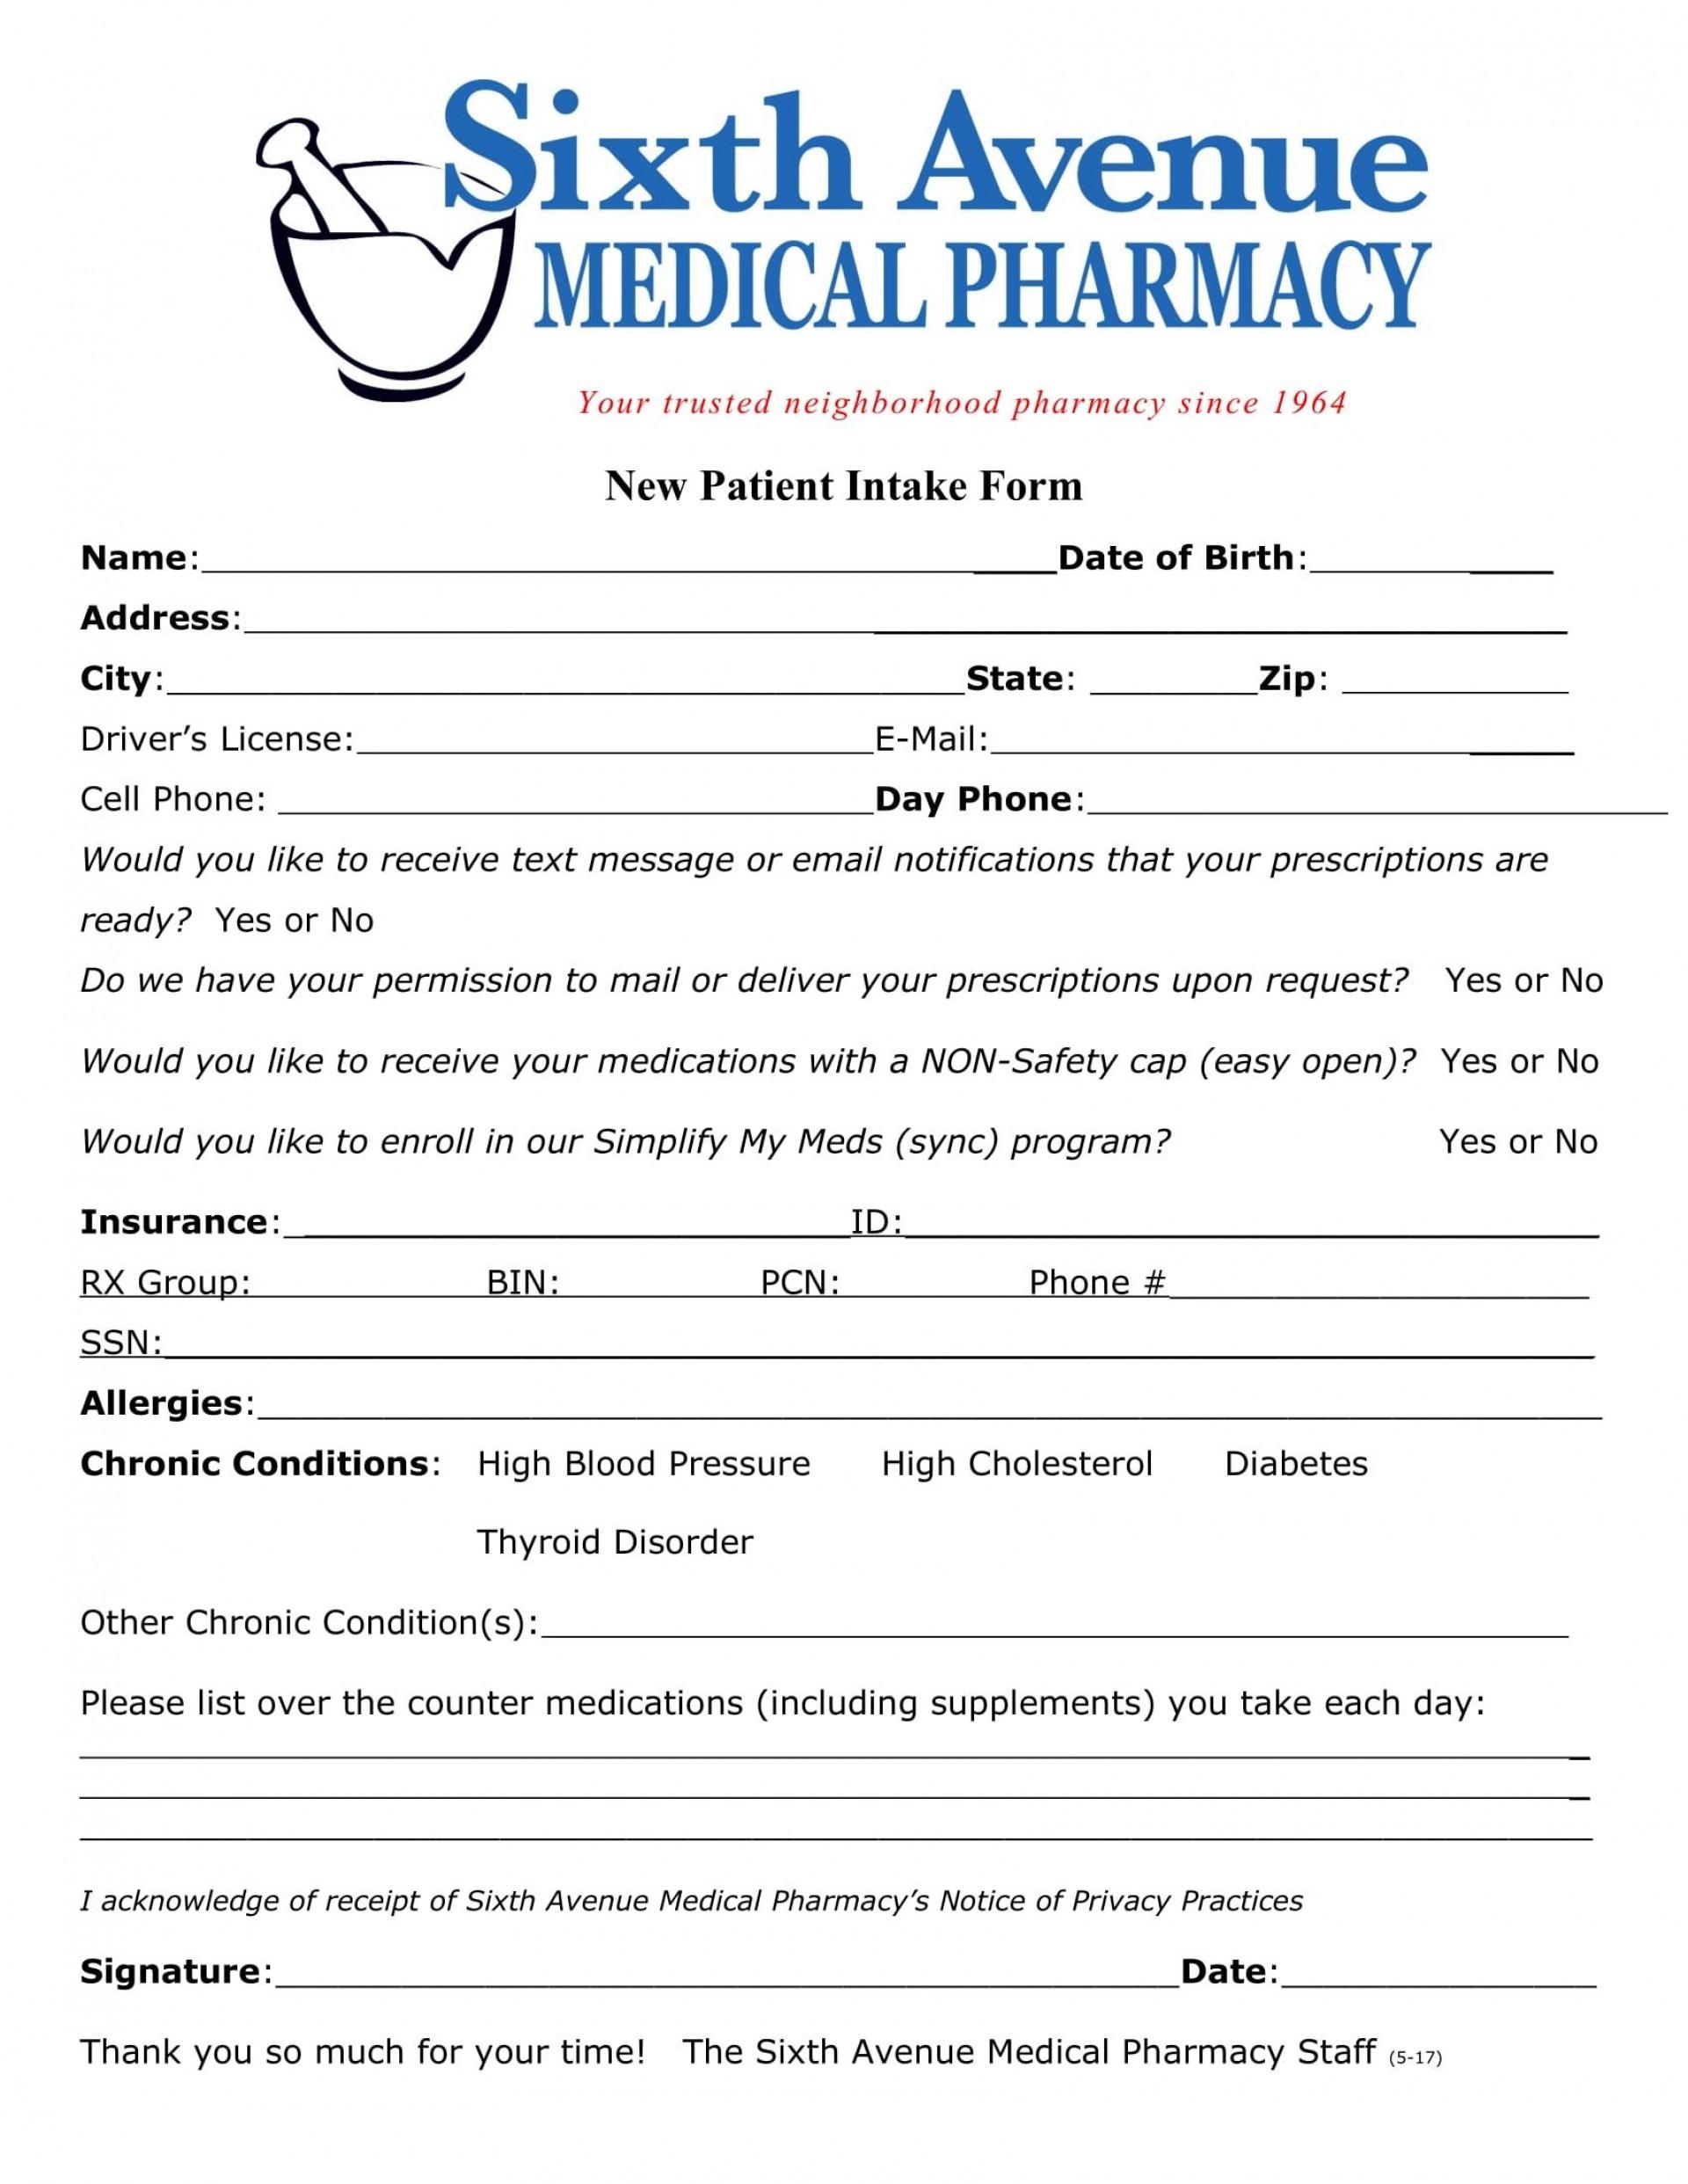 006 Sensational Patient Intake Form Template Photo  Word Client Excel Pdf1920